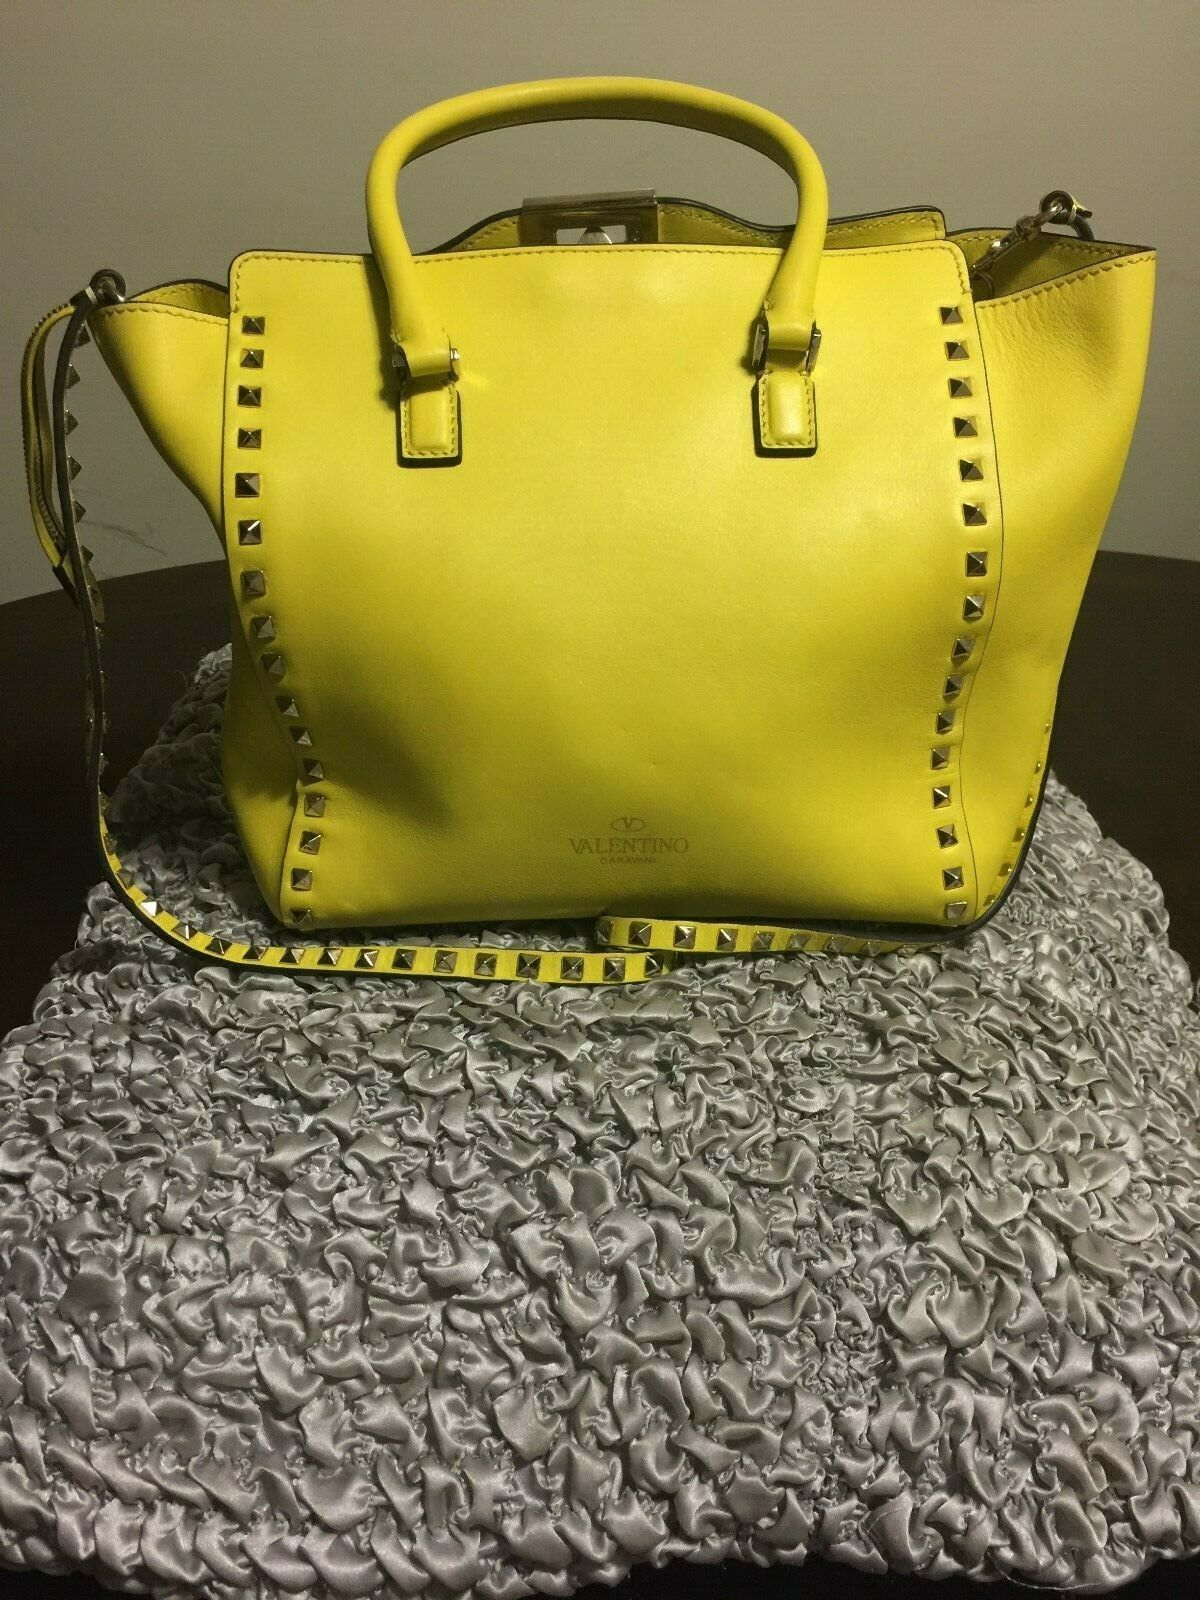 1be8b4dad Details about Valentino Garavani Petale Ruffle Yellow Napa Leather ...